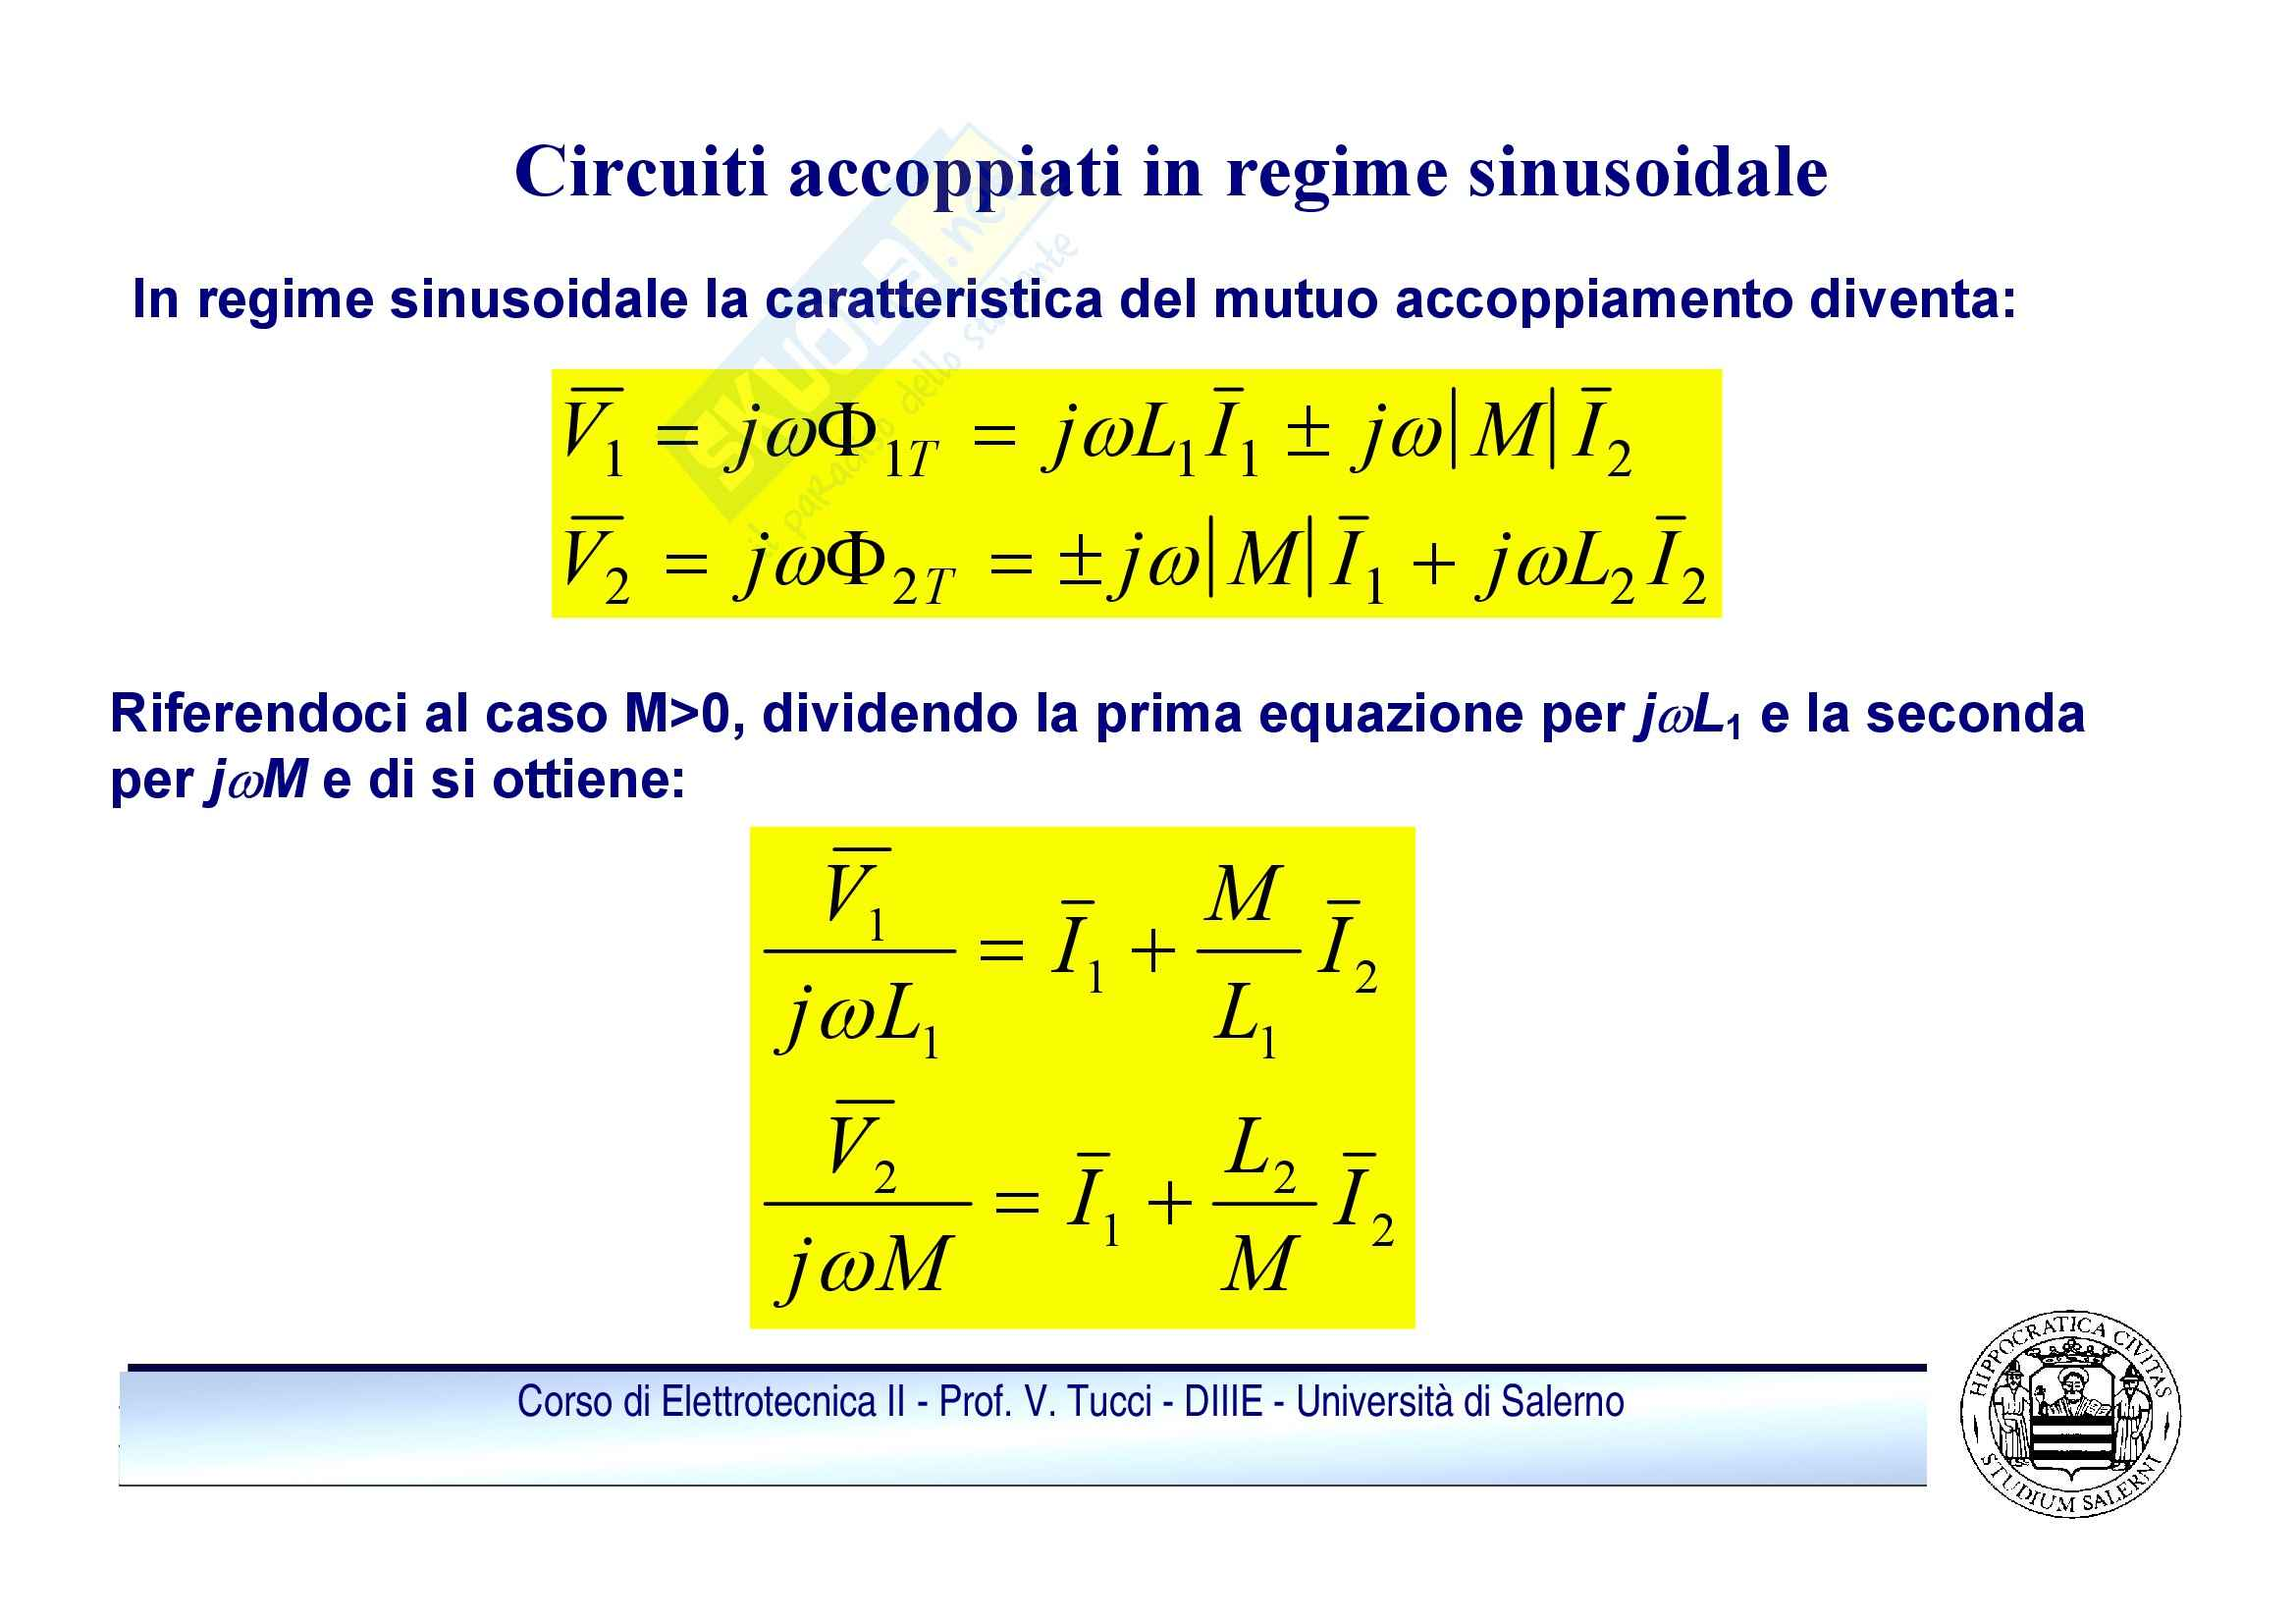 Doppi bipoli - regime sinusoidale Pag. 46